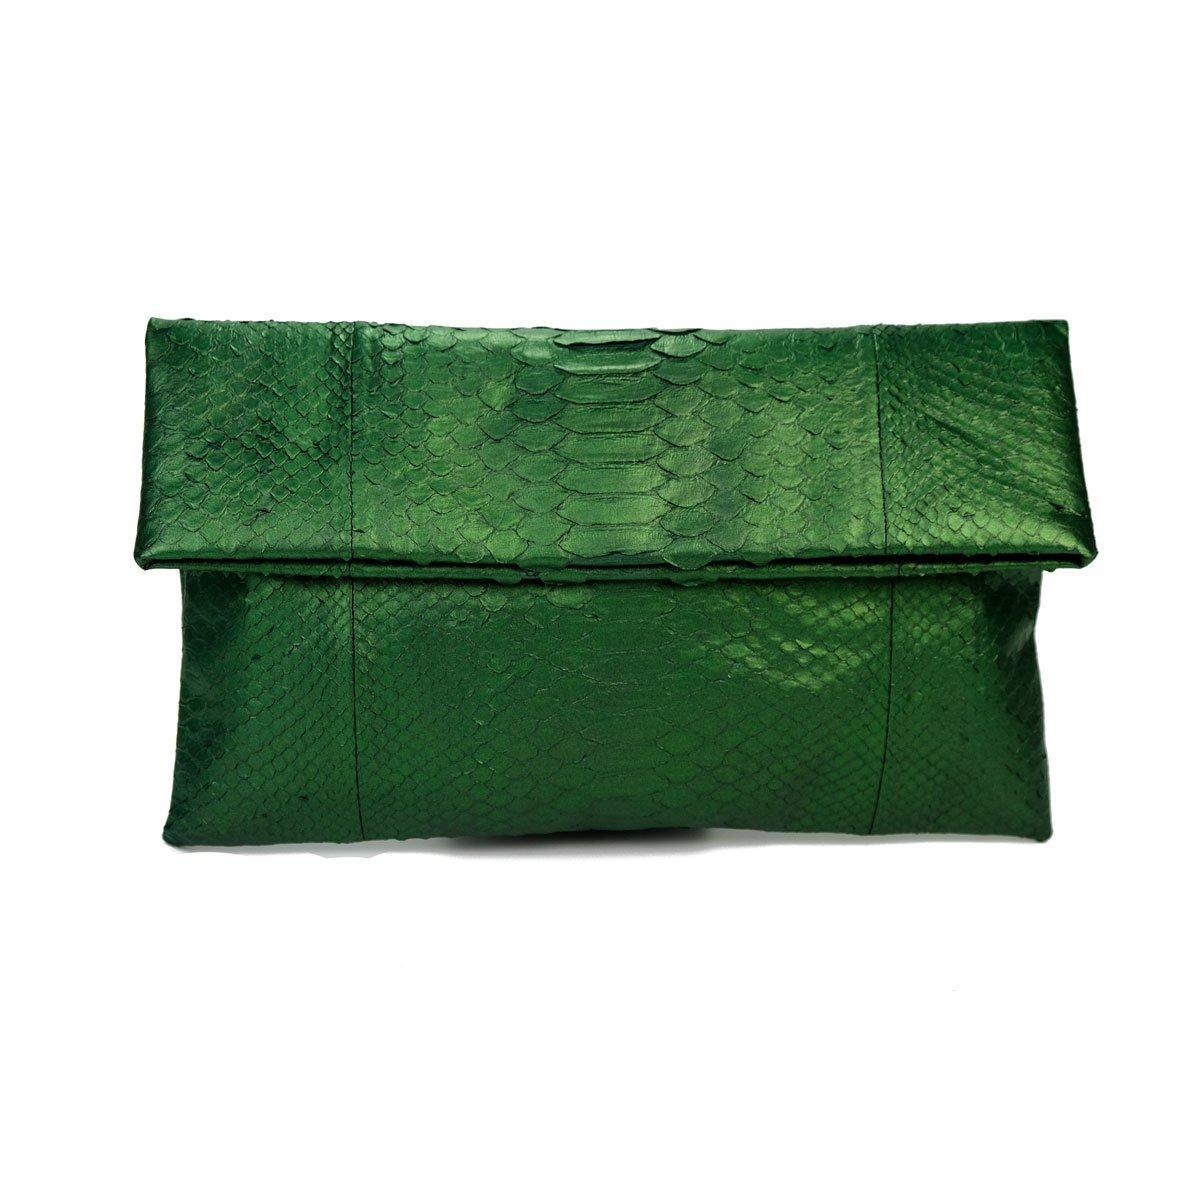 Genuine Metallic Moss Green Python Leather Classic Foldover Clutch Bag